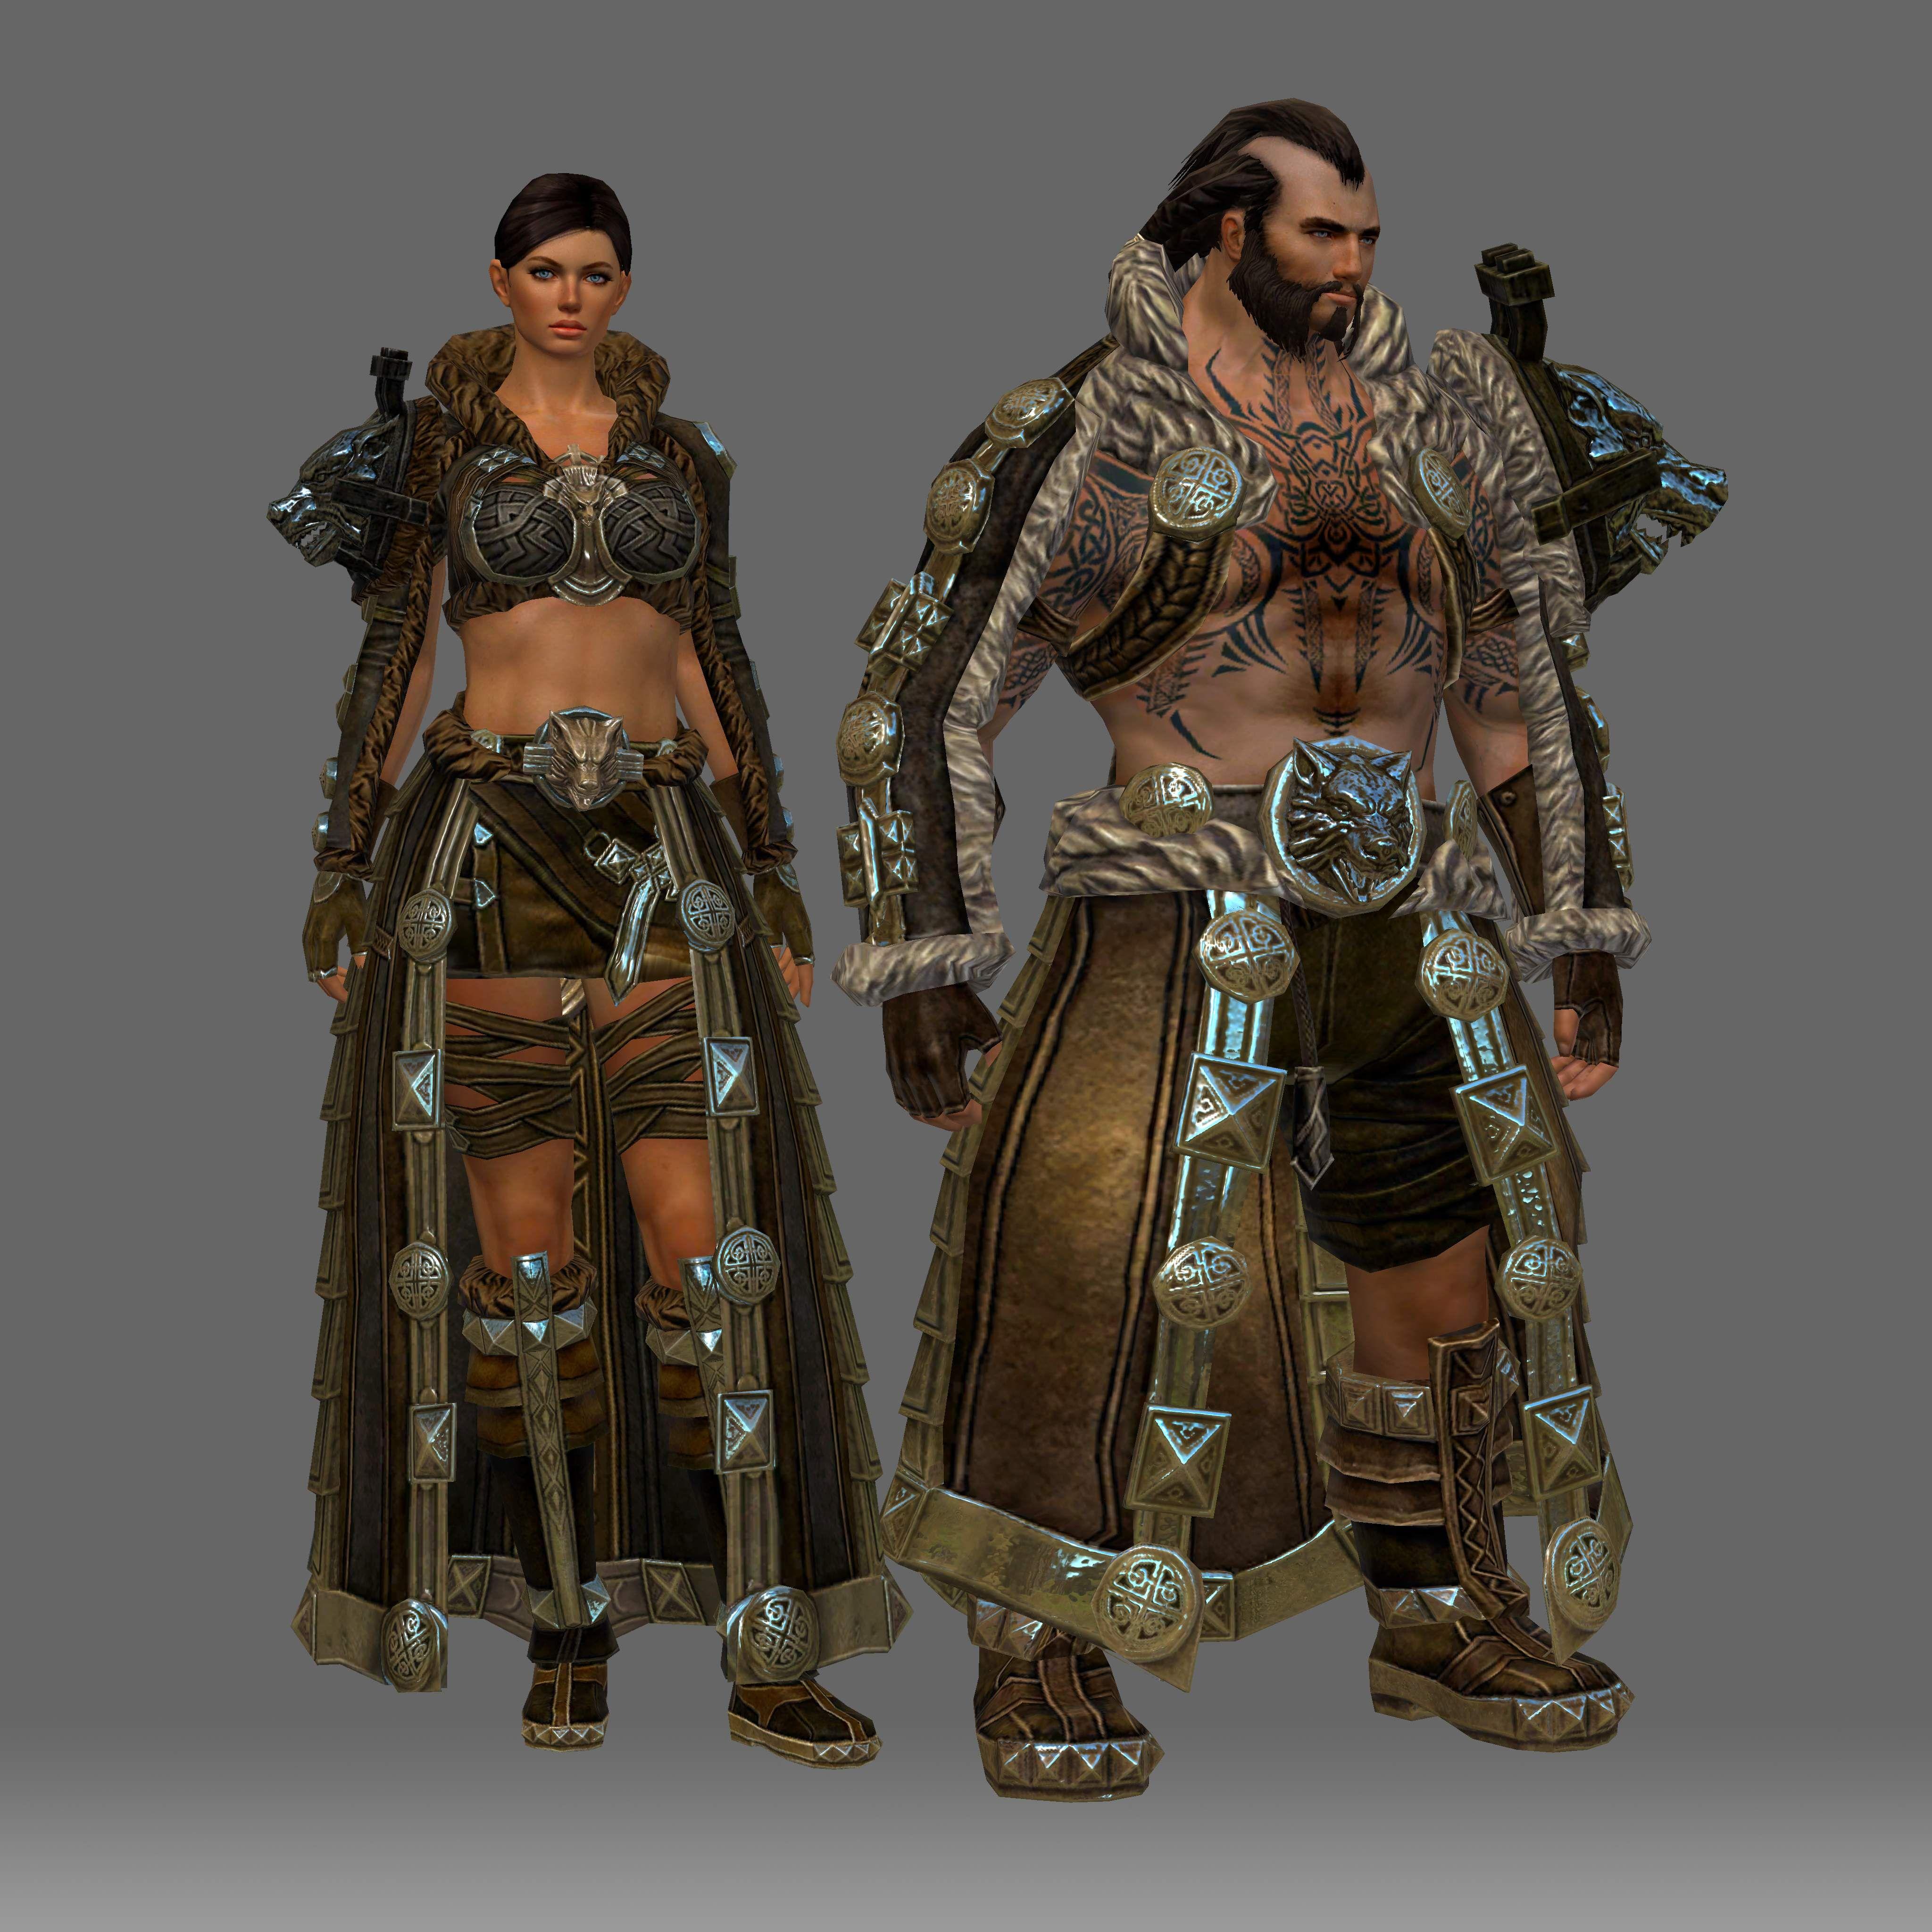 Guild wars 2 norn ranger armor